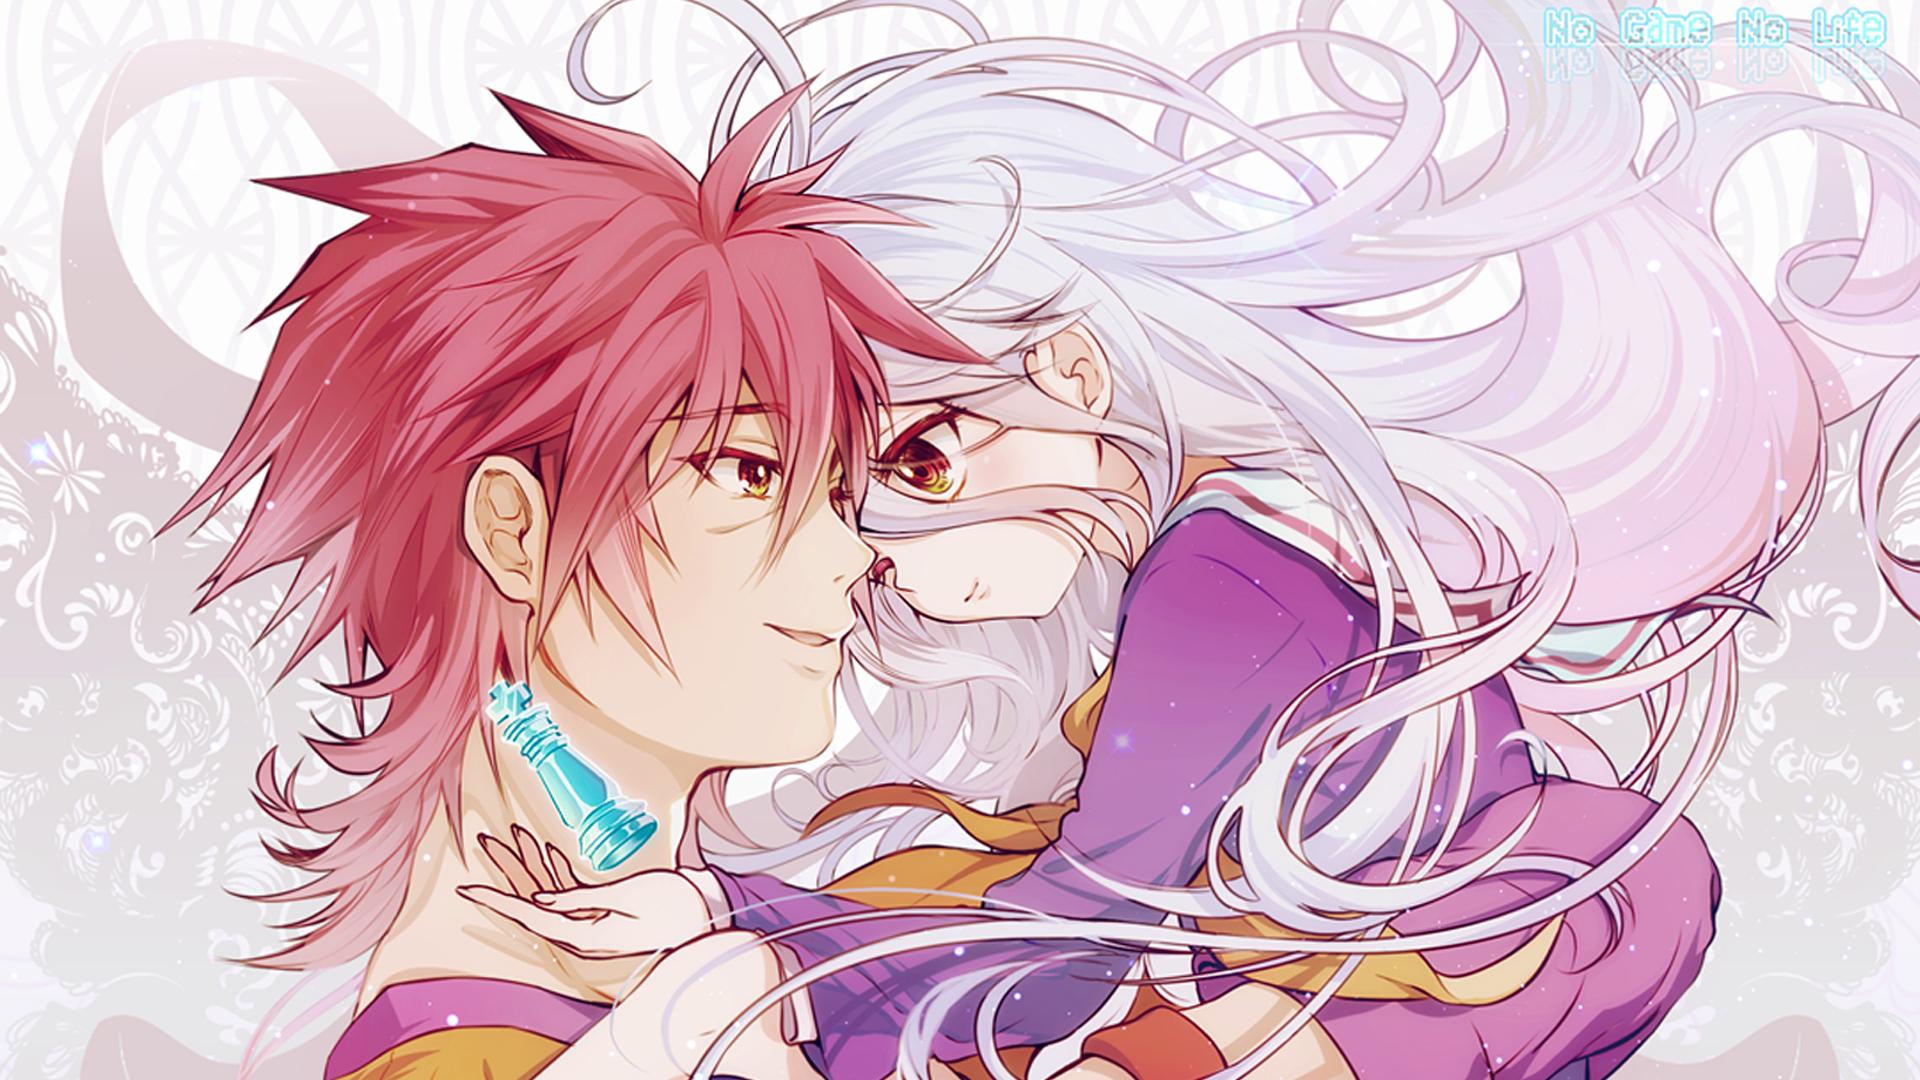 Fear Game Wallpaper Little Girl 1000 Images About Ngnl Anime Manga On Pinterest